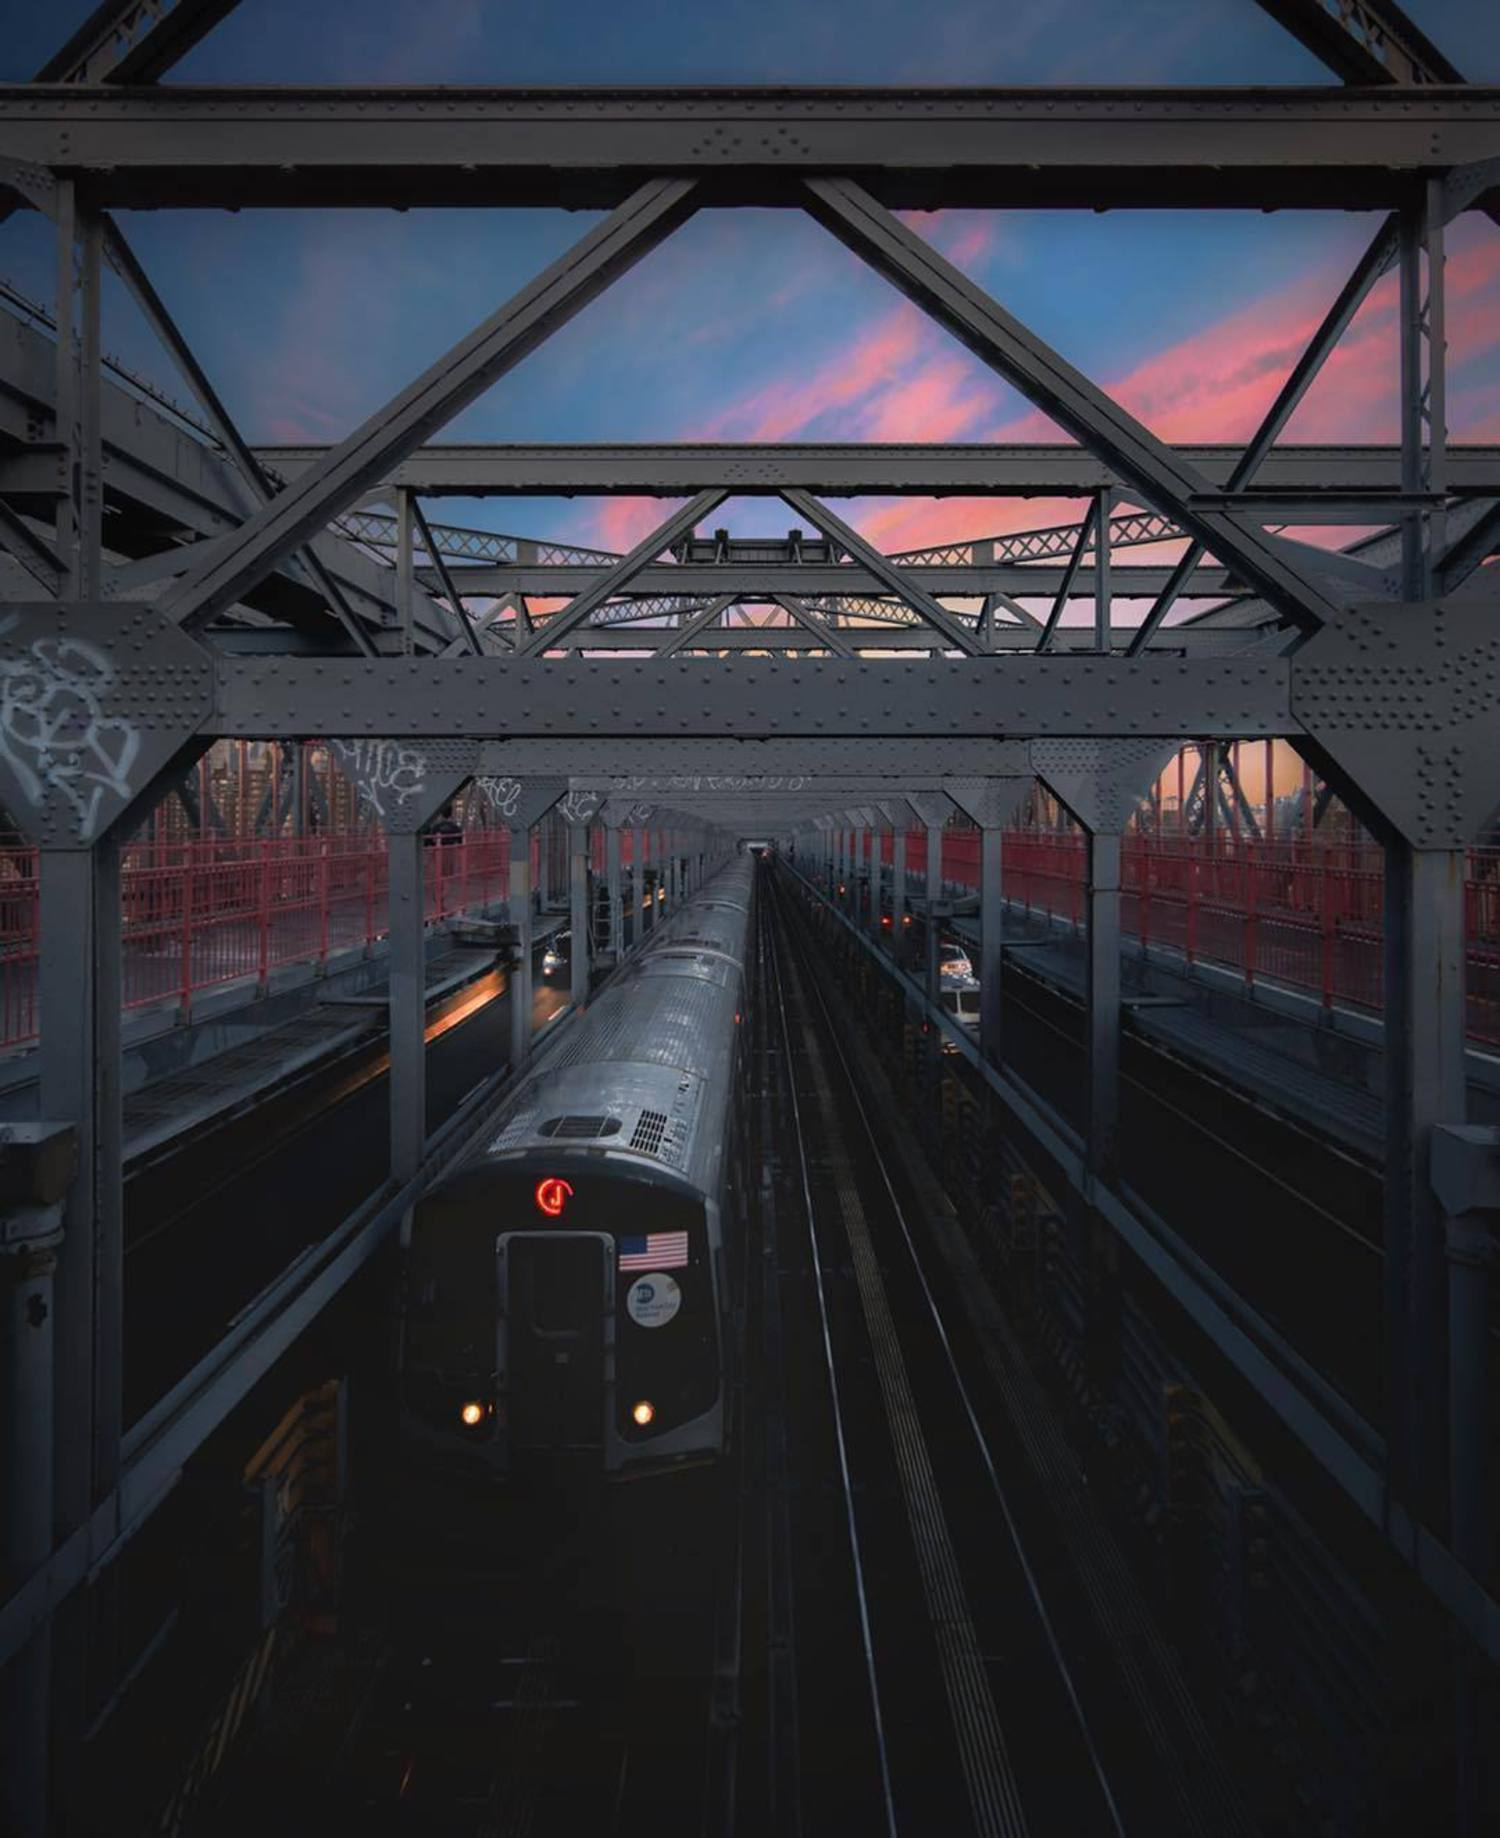 Williamsburg Bridge, New York. Photo via @urbnxplrtn #viewingnyc #newyork #newyorkcity #nyc #williamsburgbridge #subway #sunsets